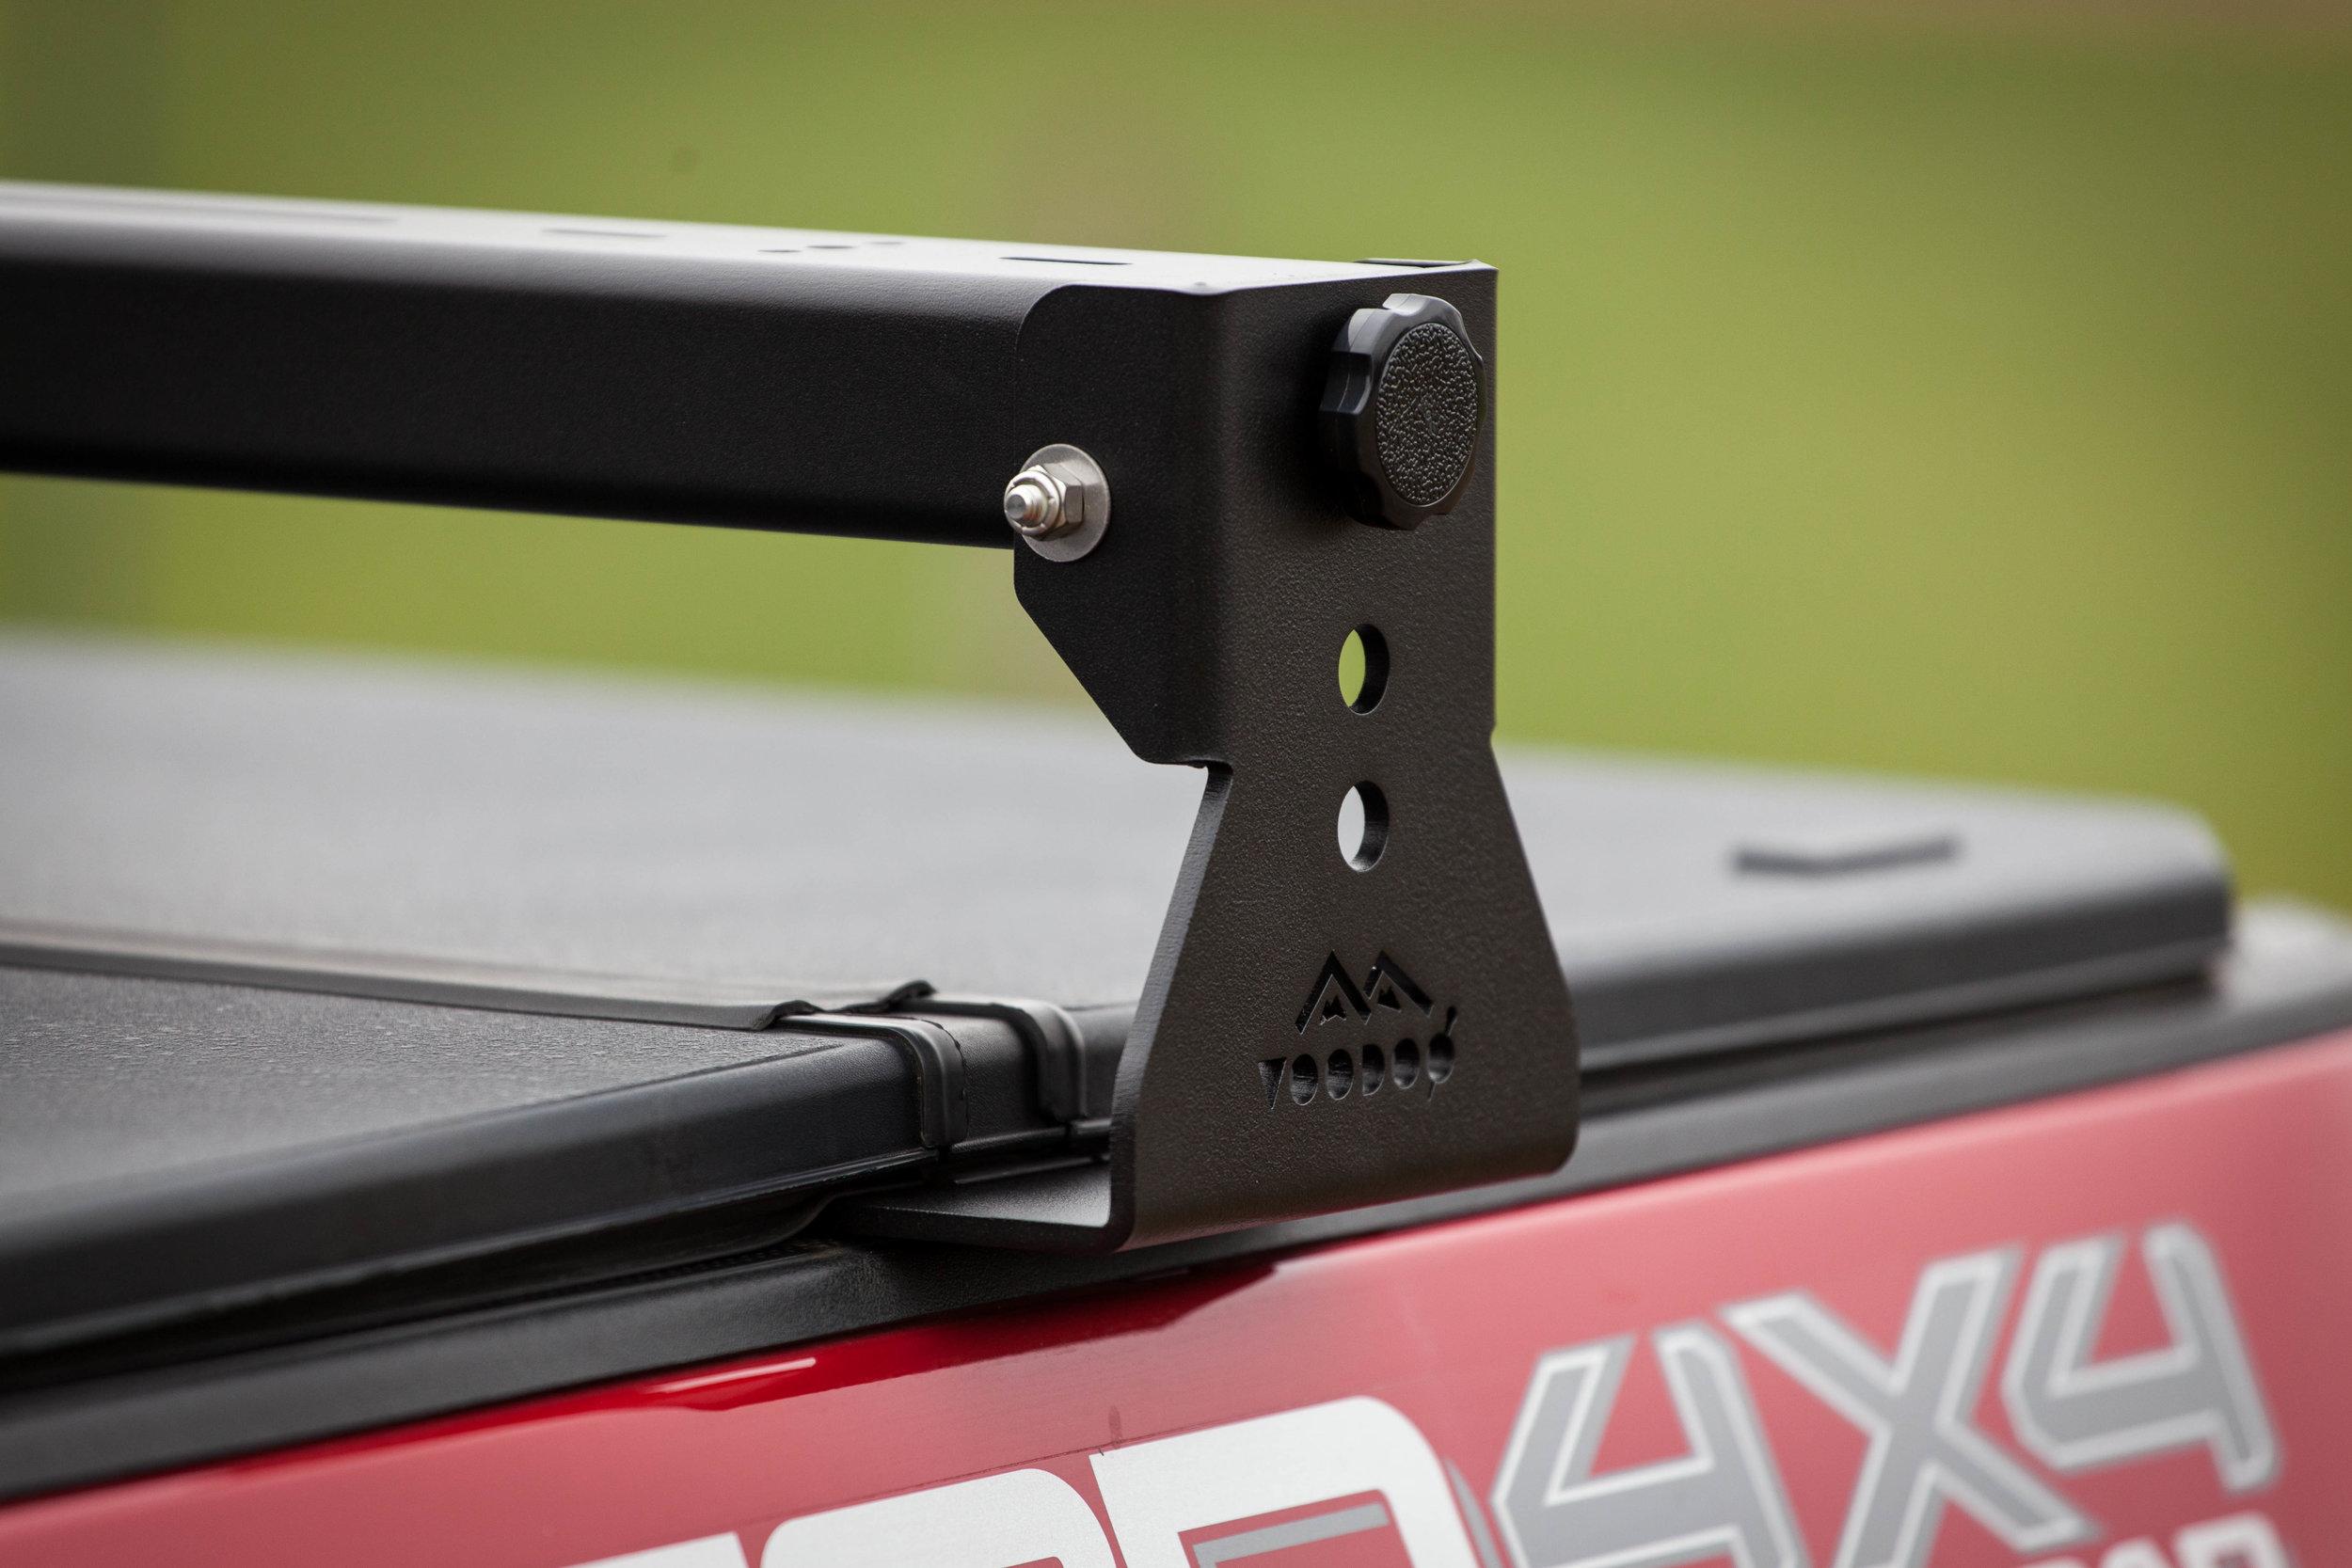 universal truck crossbars for tonneau covers fits all trucks kb voodoo fabrications